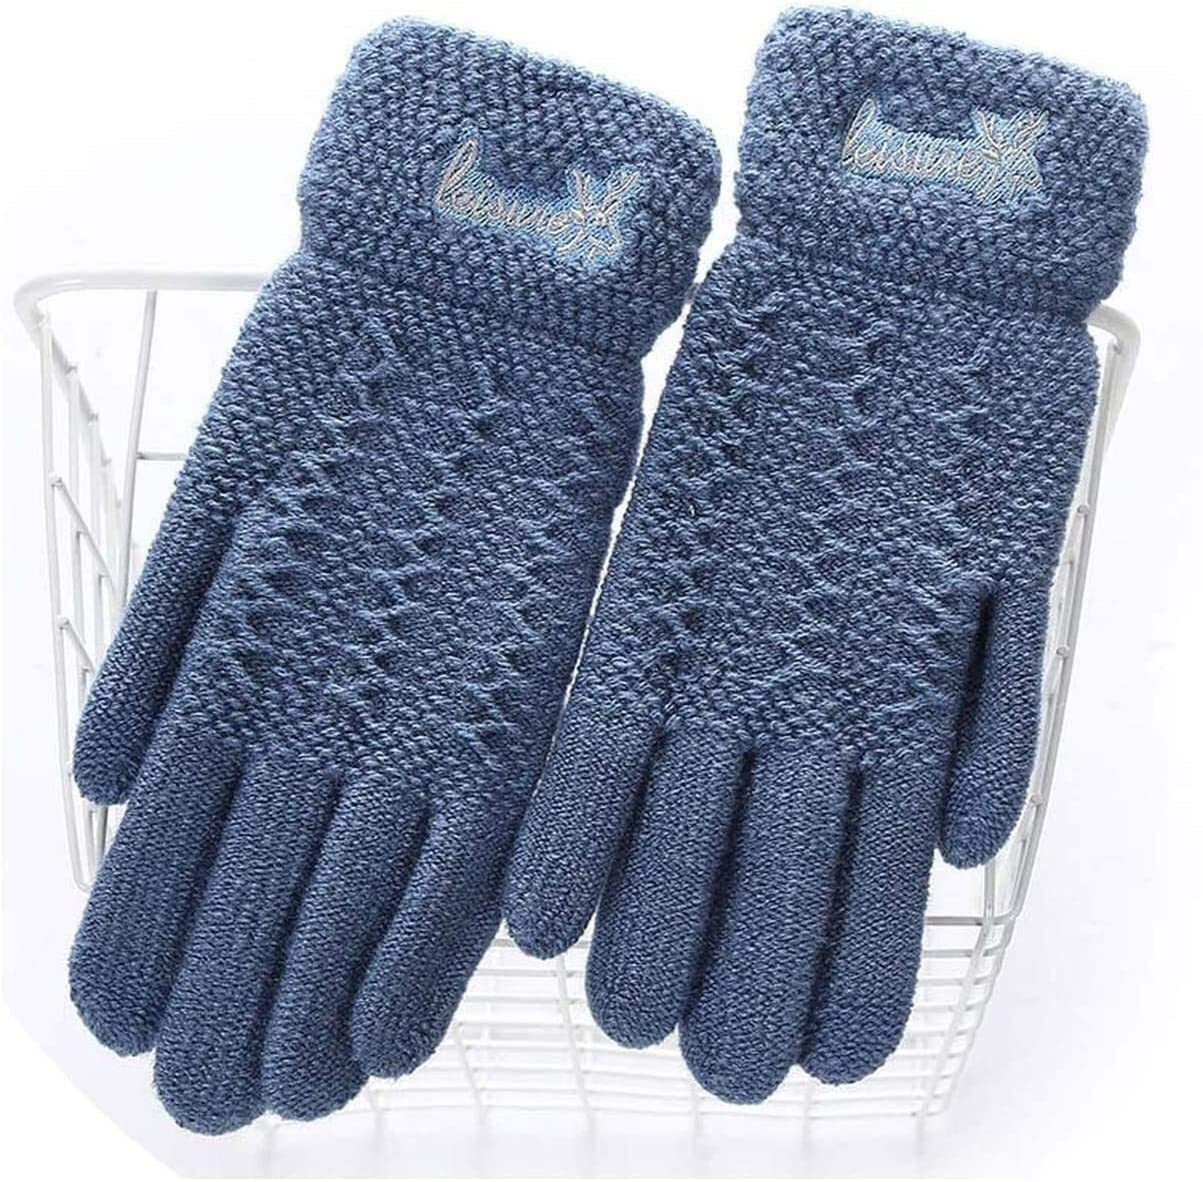 Warm Gloves Ladies Winter Warm Cute Cartoon Finger Knit Touch Screen Gloves Women Full Finger Soft Mittens Black Gloves (Color : E Sea Blue, Size : Oneszie)